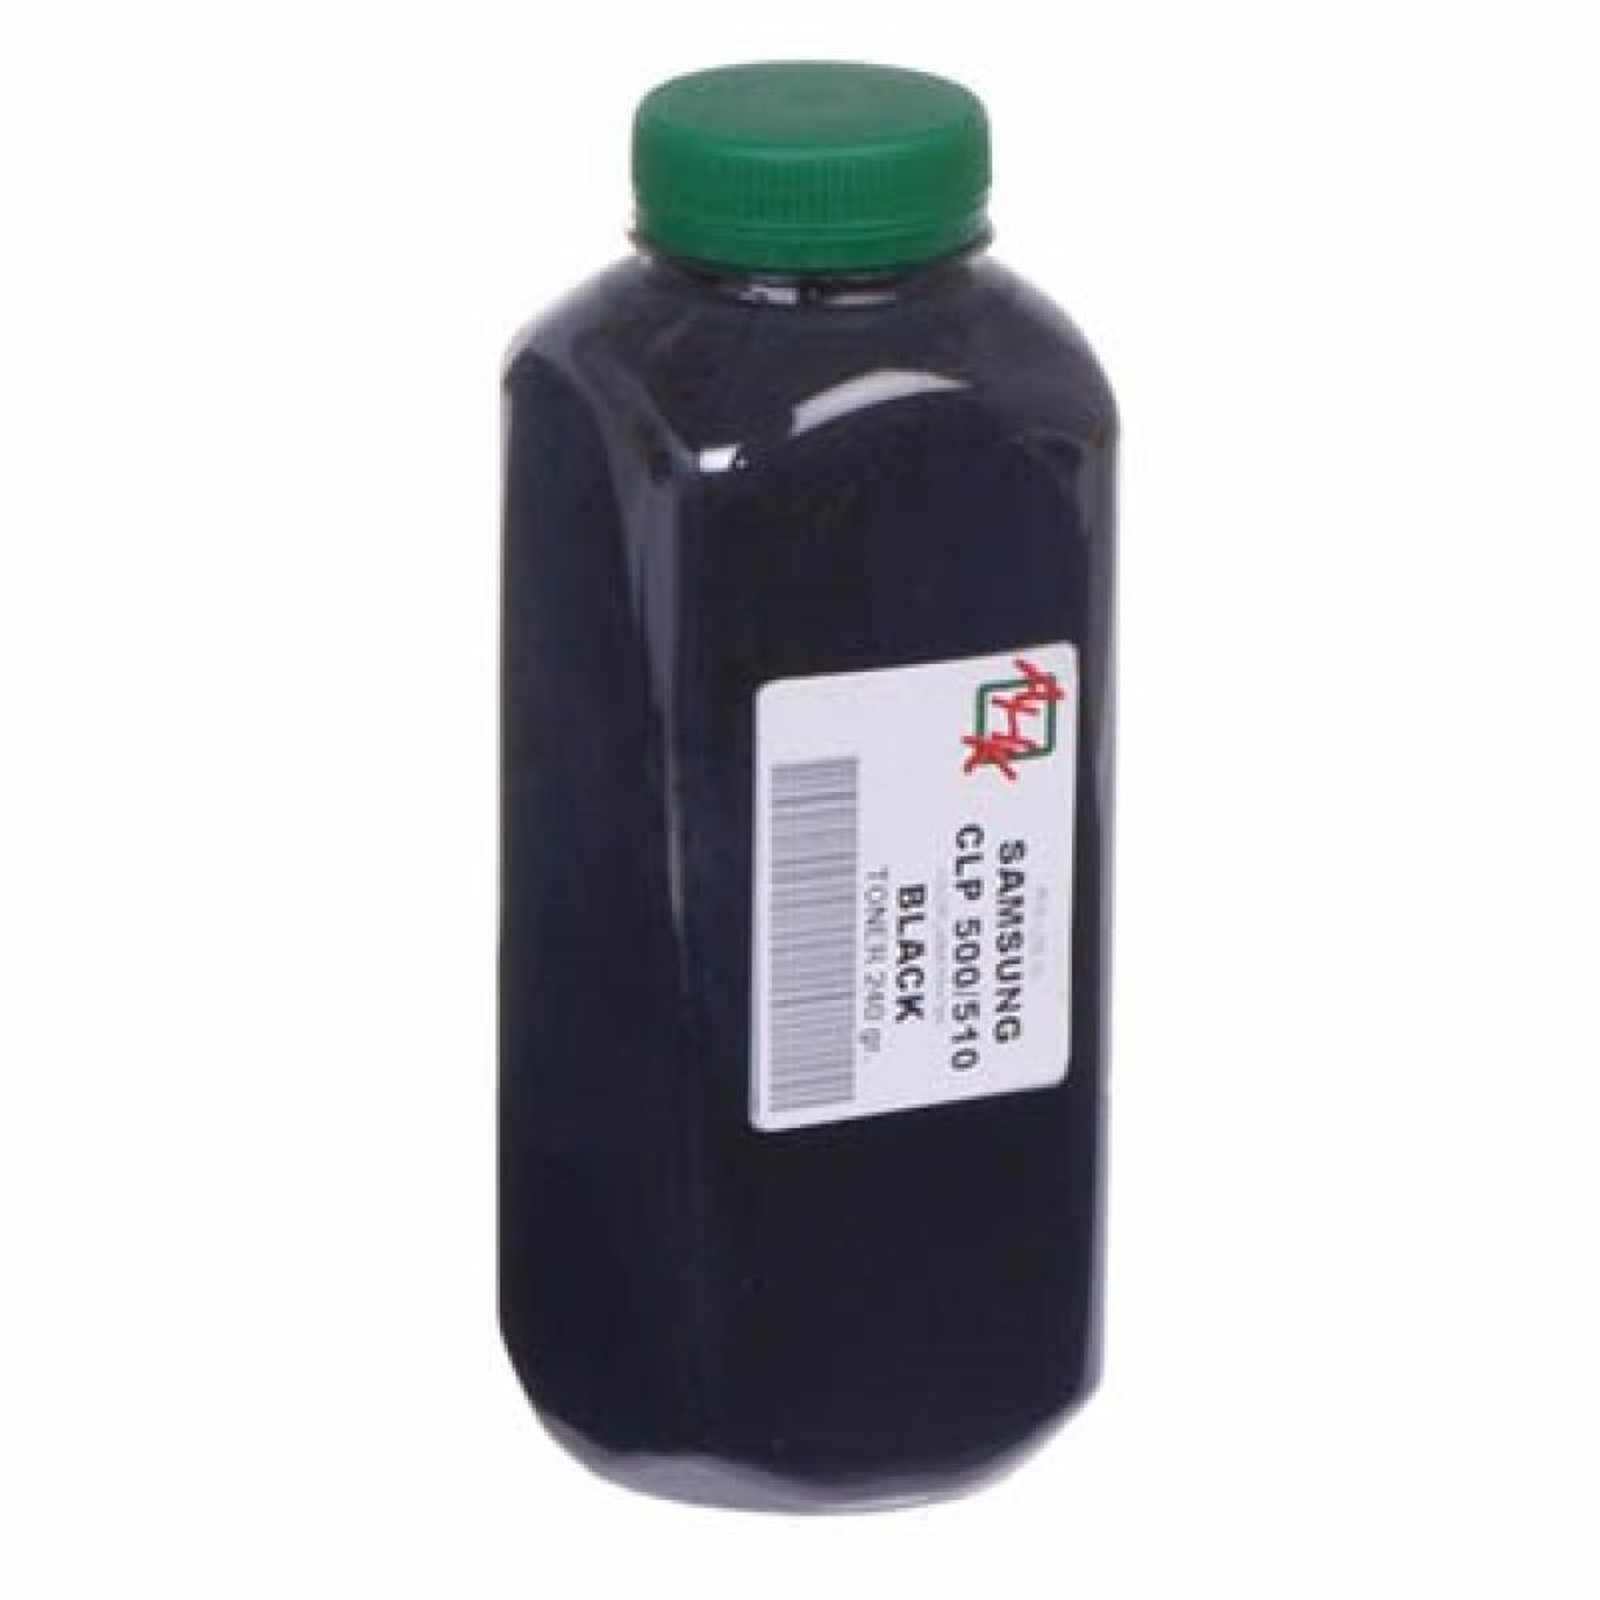 Тонер SAMSUNG CLP-500 Black AHK (1502570)